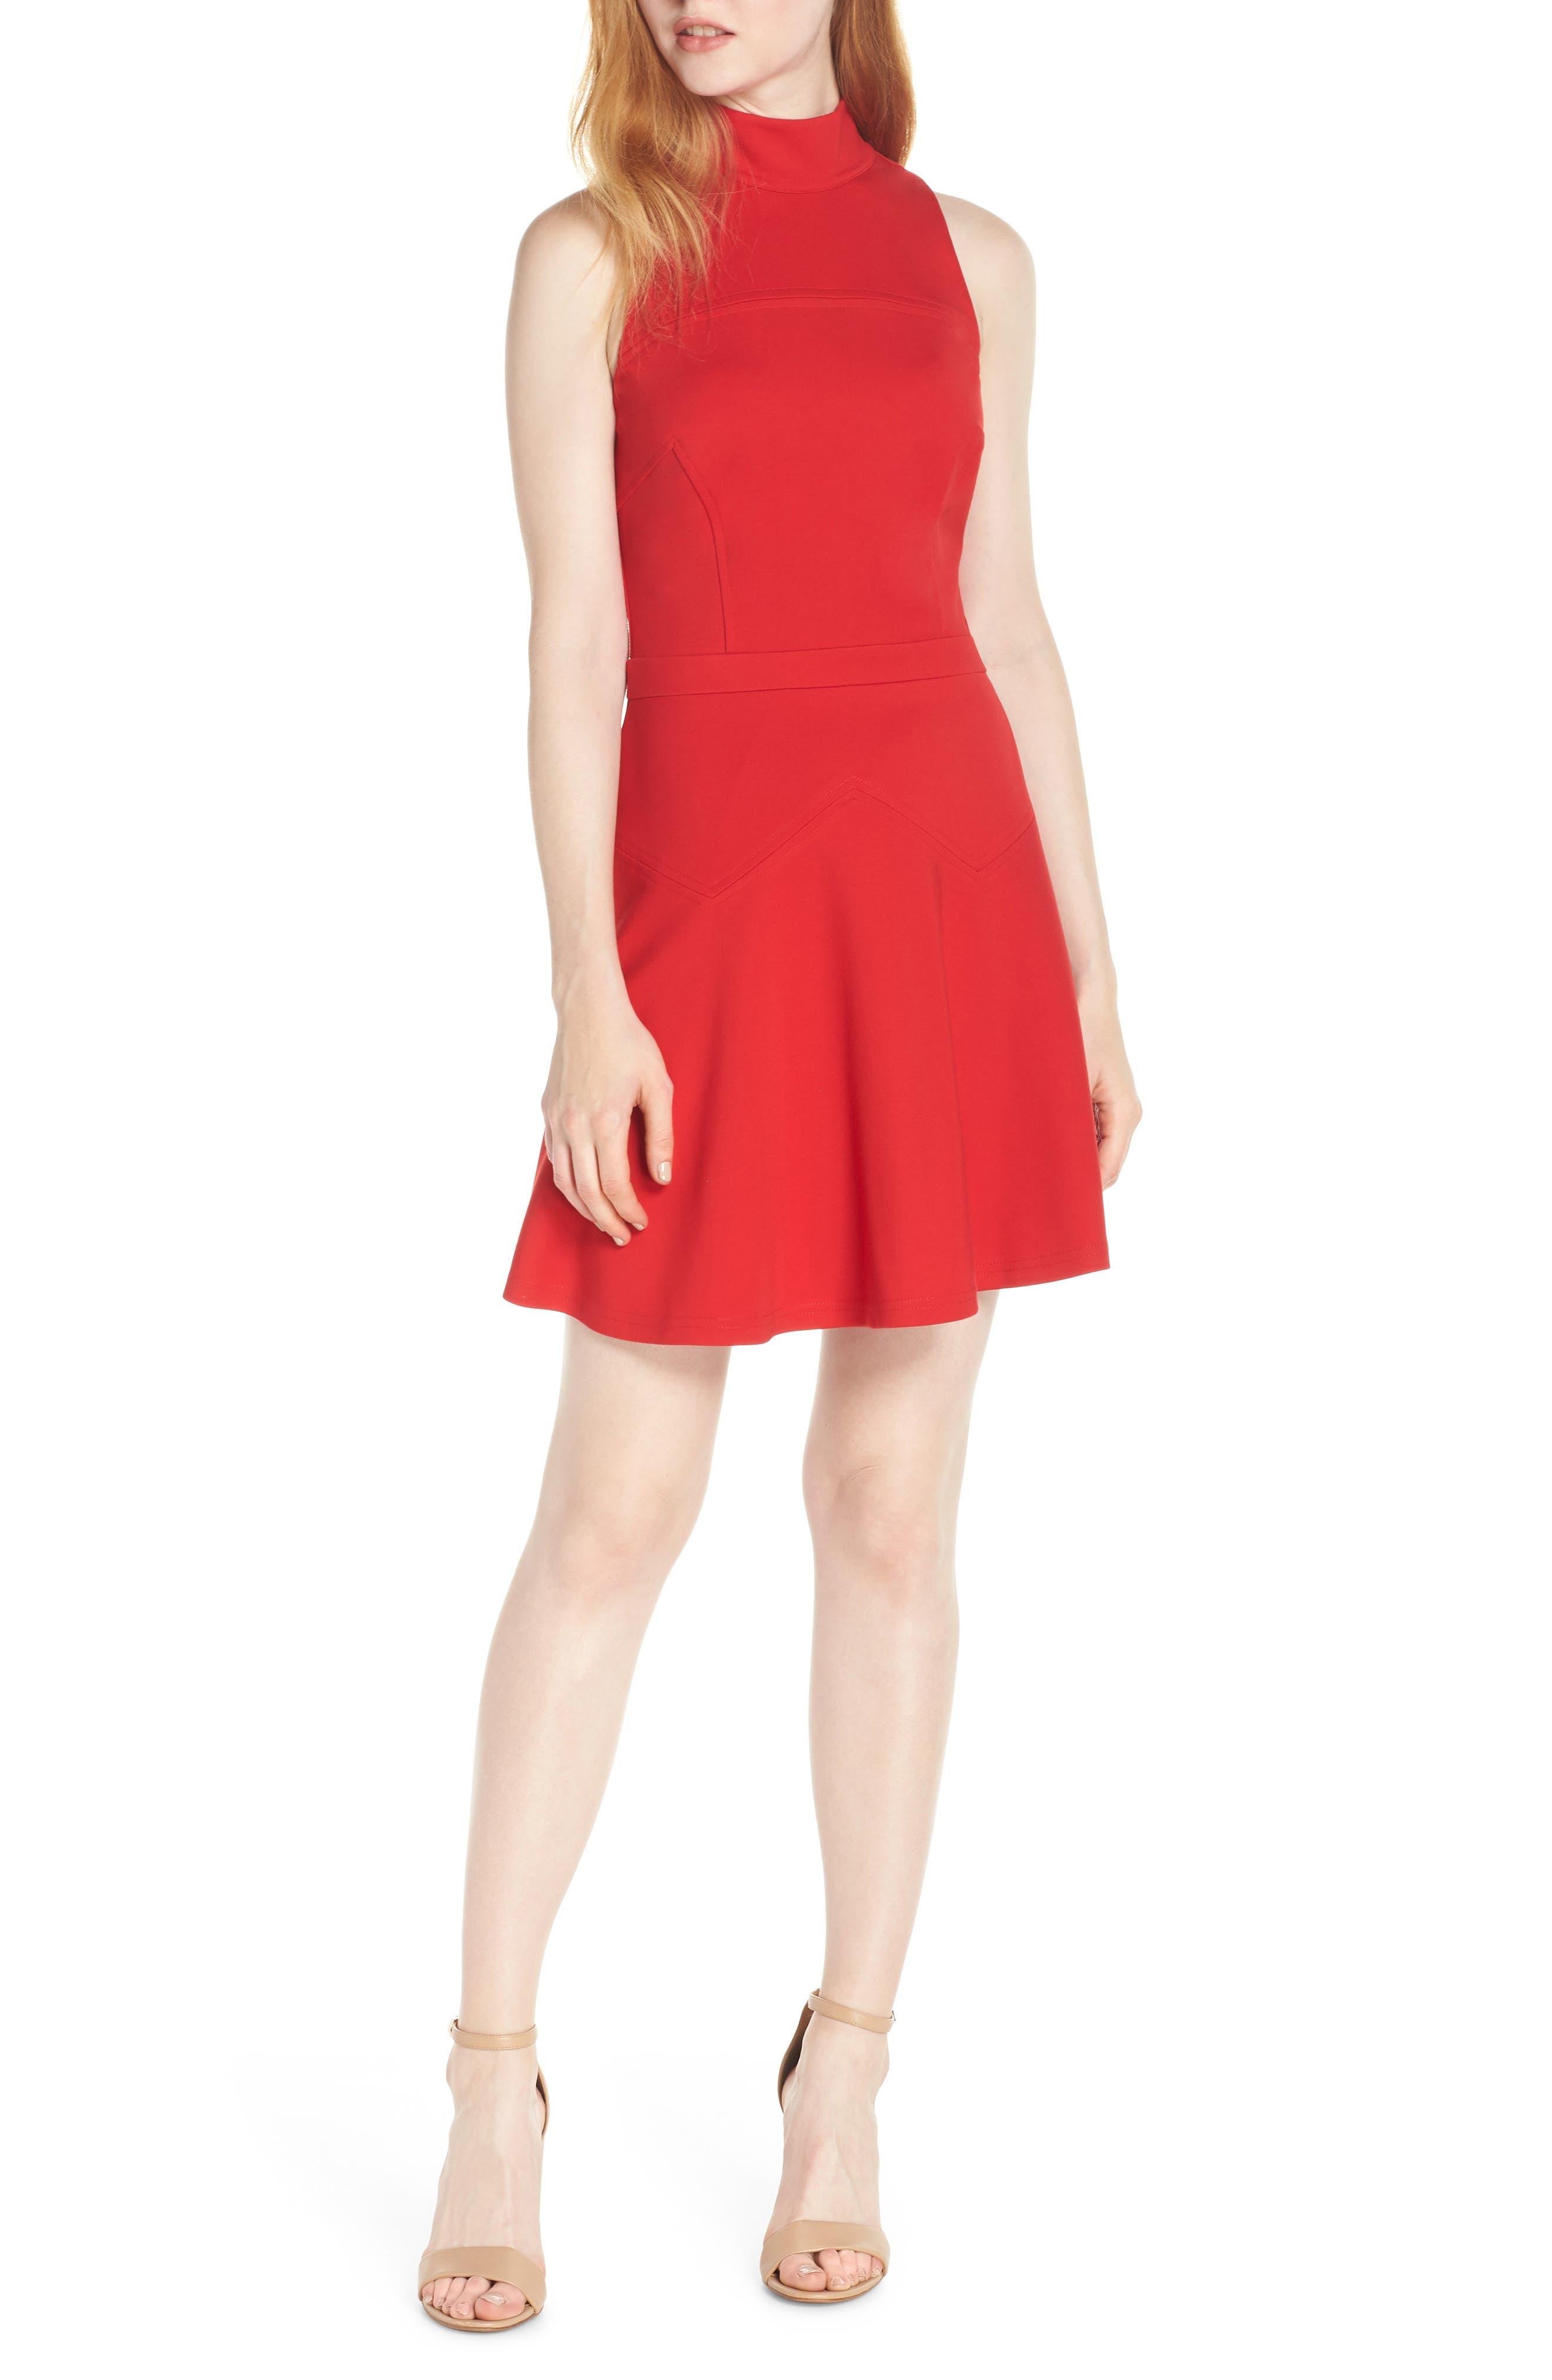 ALI & JAY Melt My Heart Minidress in Scarlet